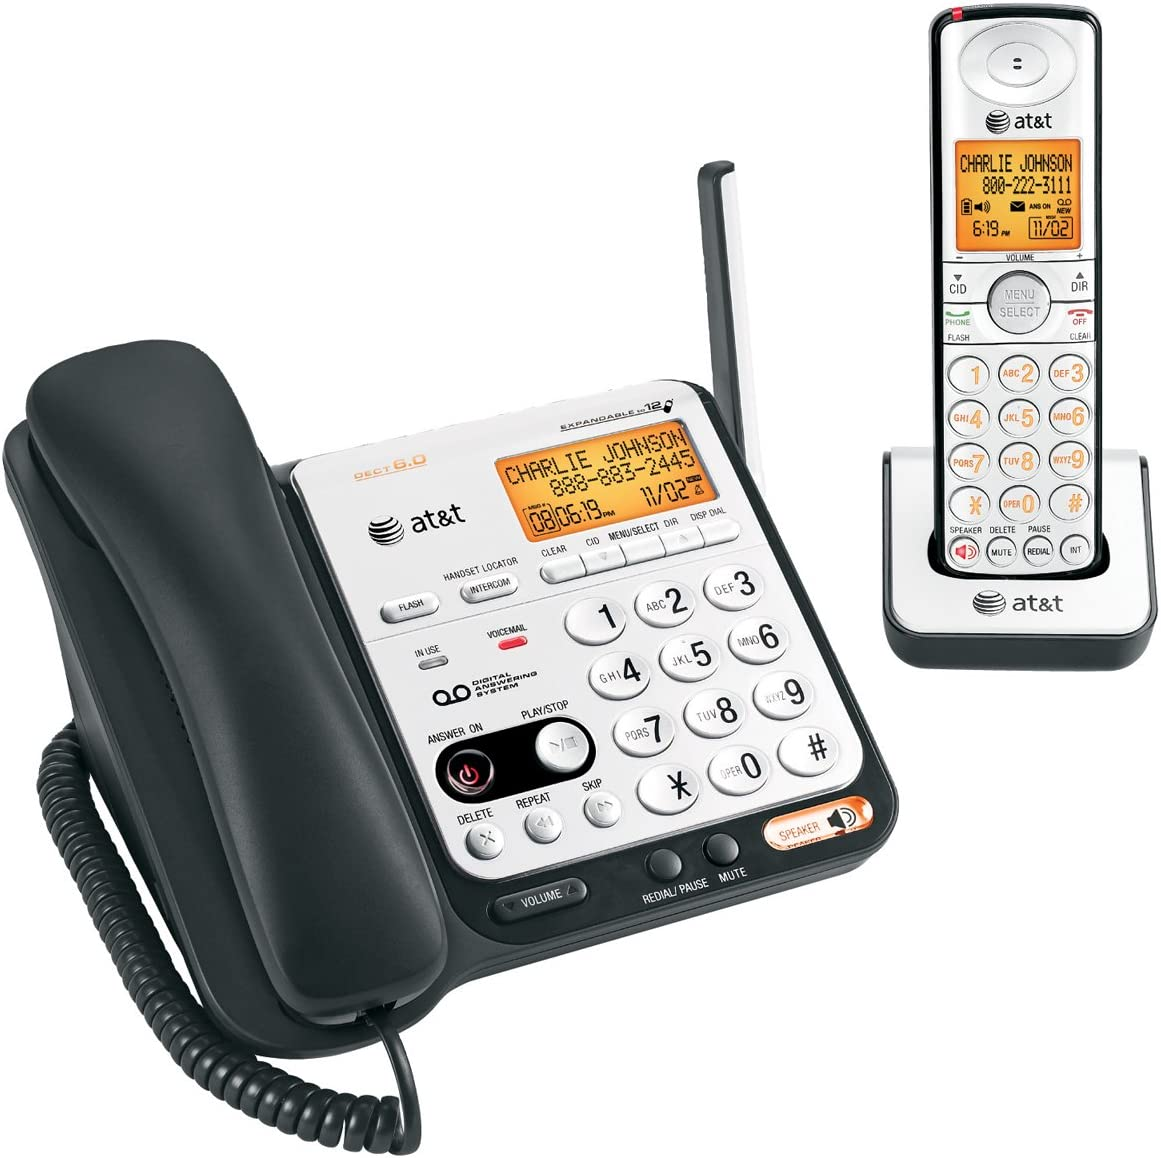 AT/&T CL84109  DECT 6.0 1.9GHz Expansion Cordless handset